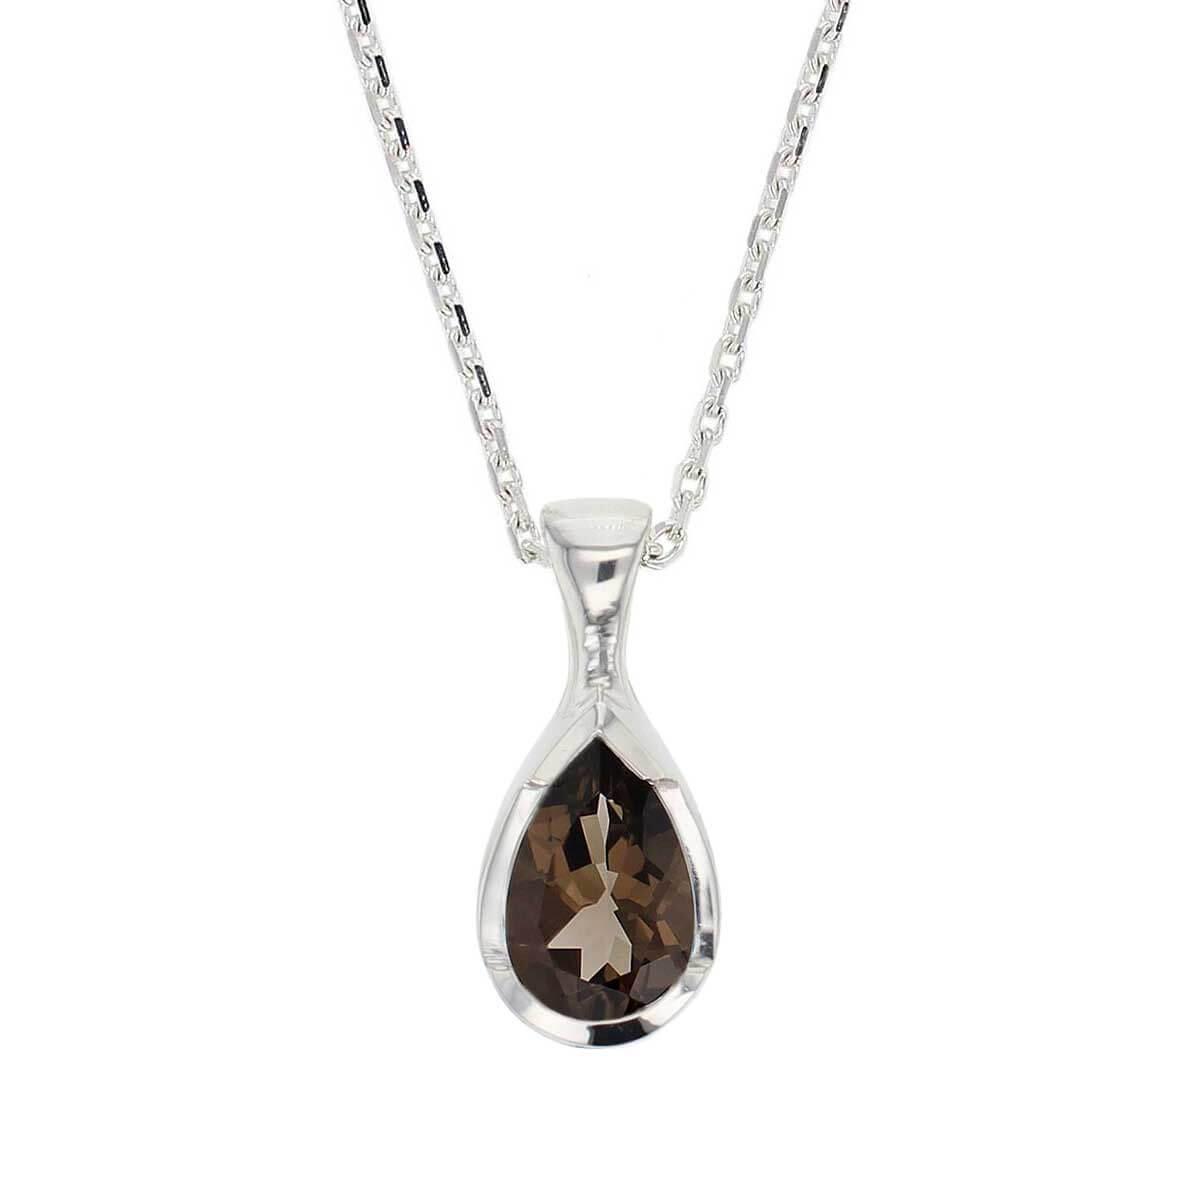 sterling silver pear cut faceted smoky quartz gemstone pendant, designer jewellery, brown quartz gem, jewelry, handmade by Faller, Londonderry, Northern Ireland, Irish hand crafted, darcy, D'arcy, smokey